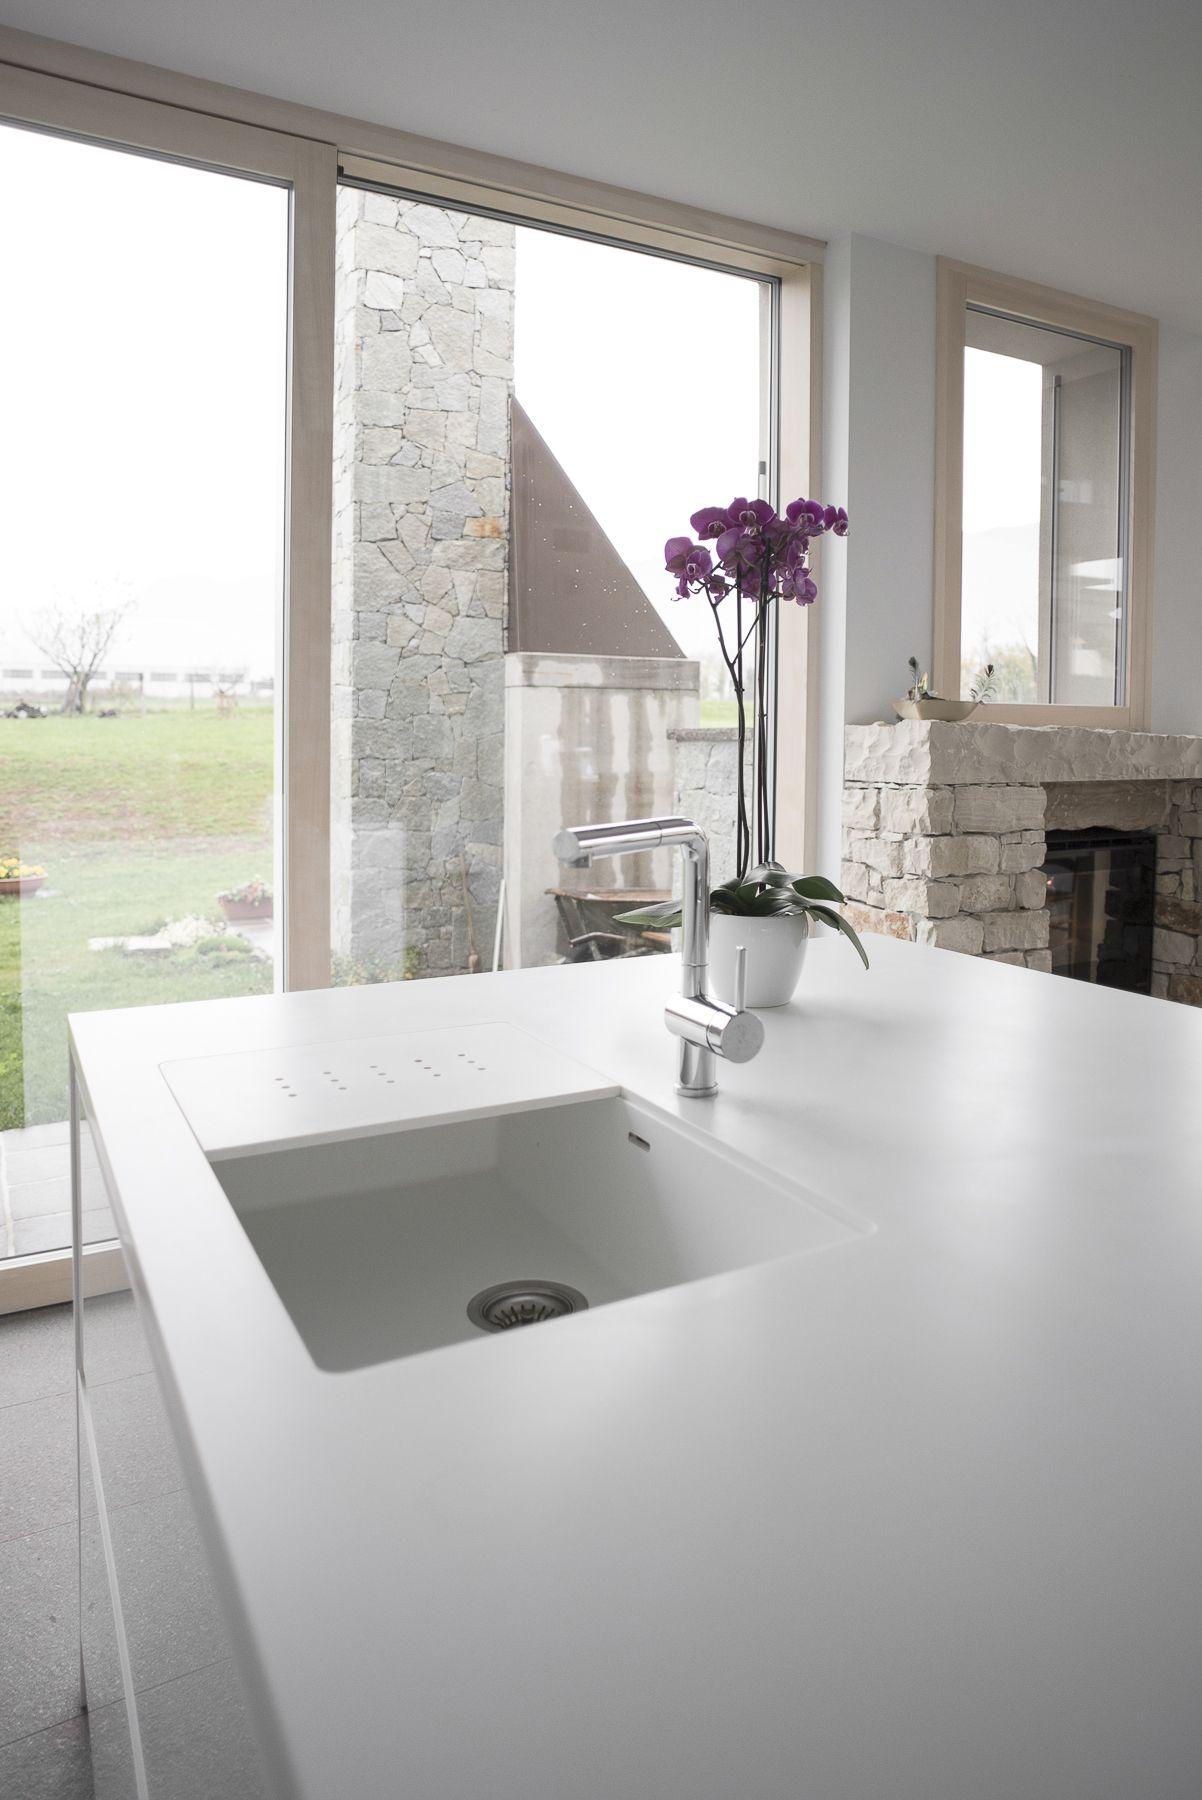 Corian #top #kitchen #sink #white #minimal #island The Corian top ...